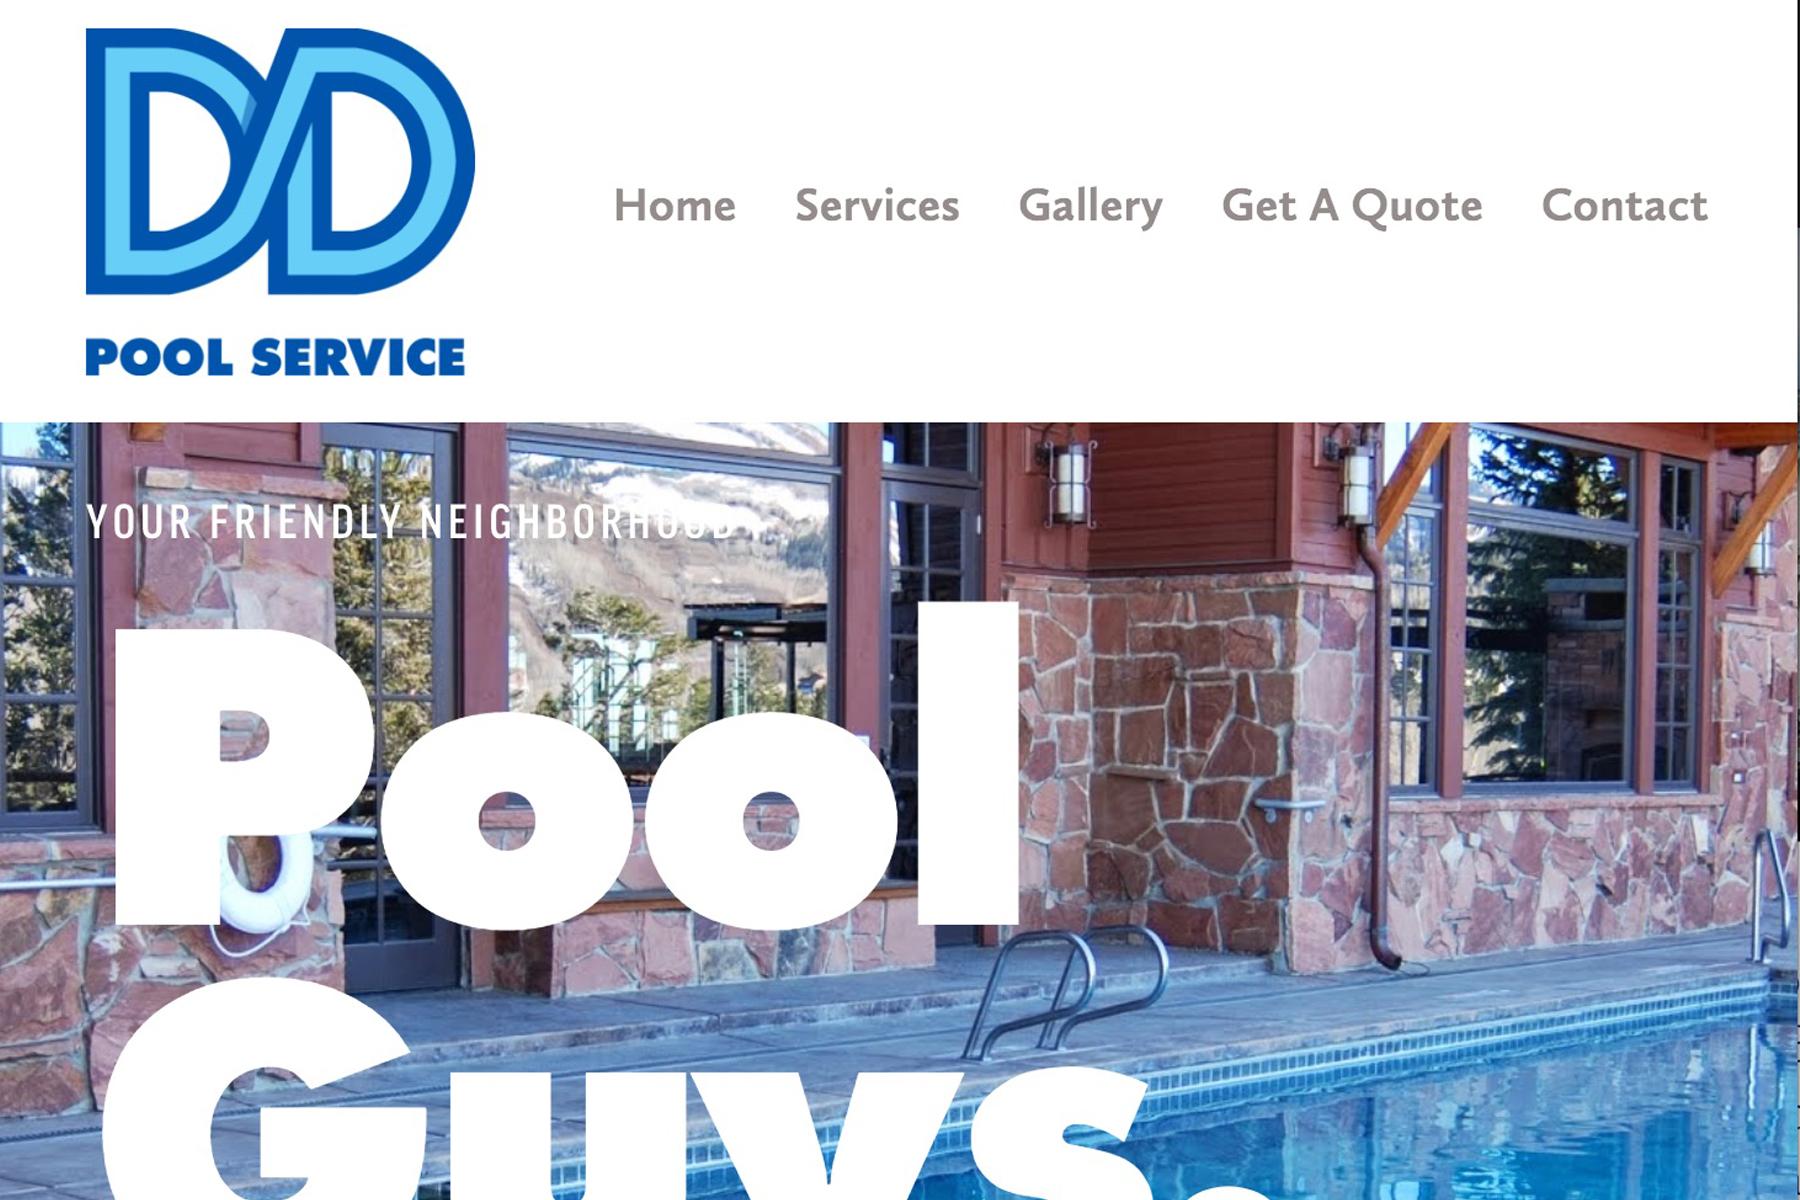 DD-Pools-Branding.jpg